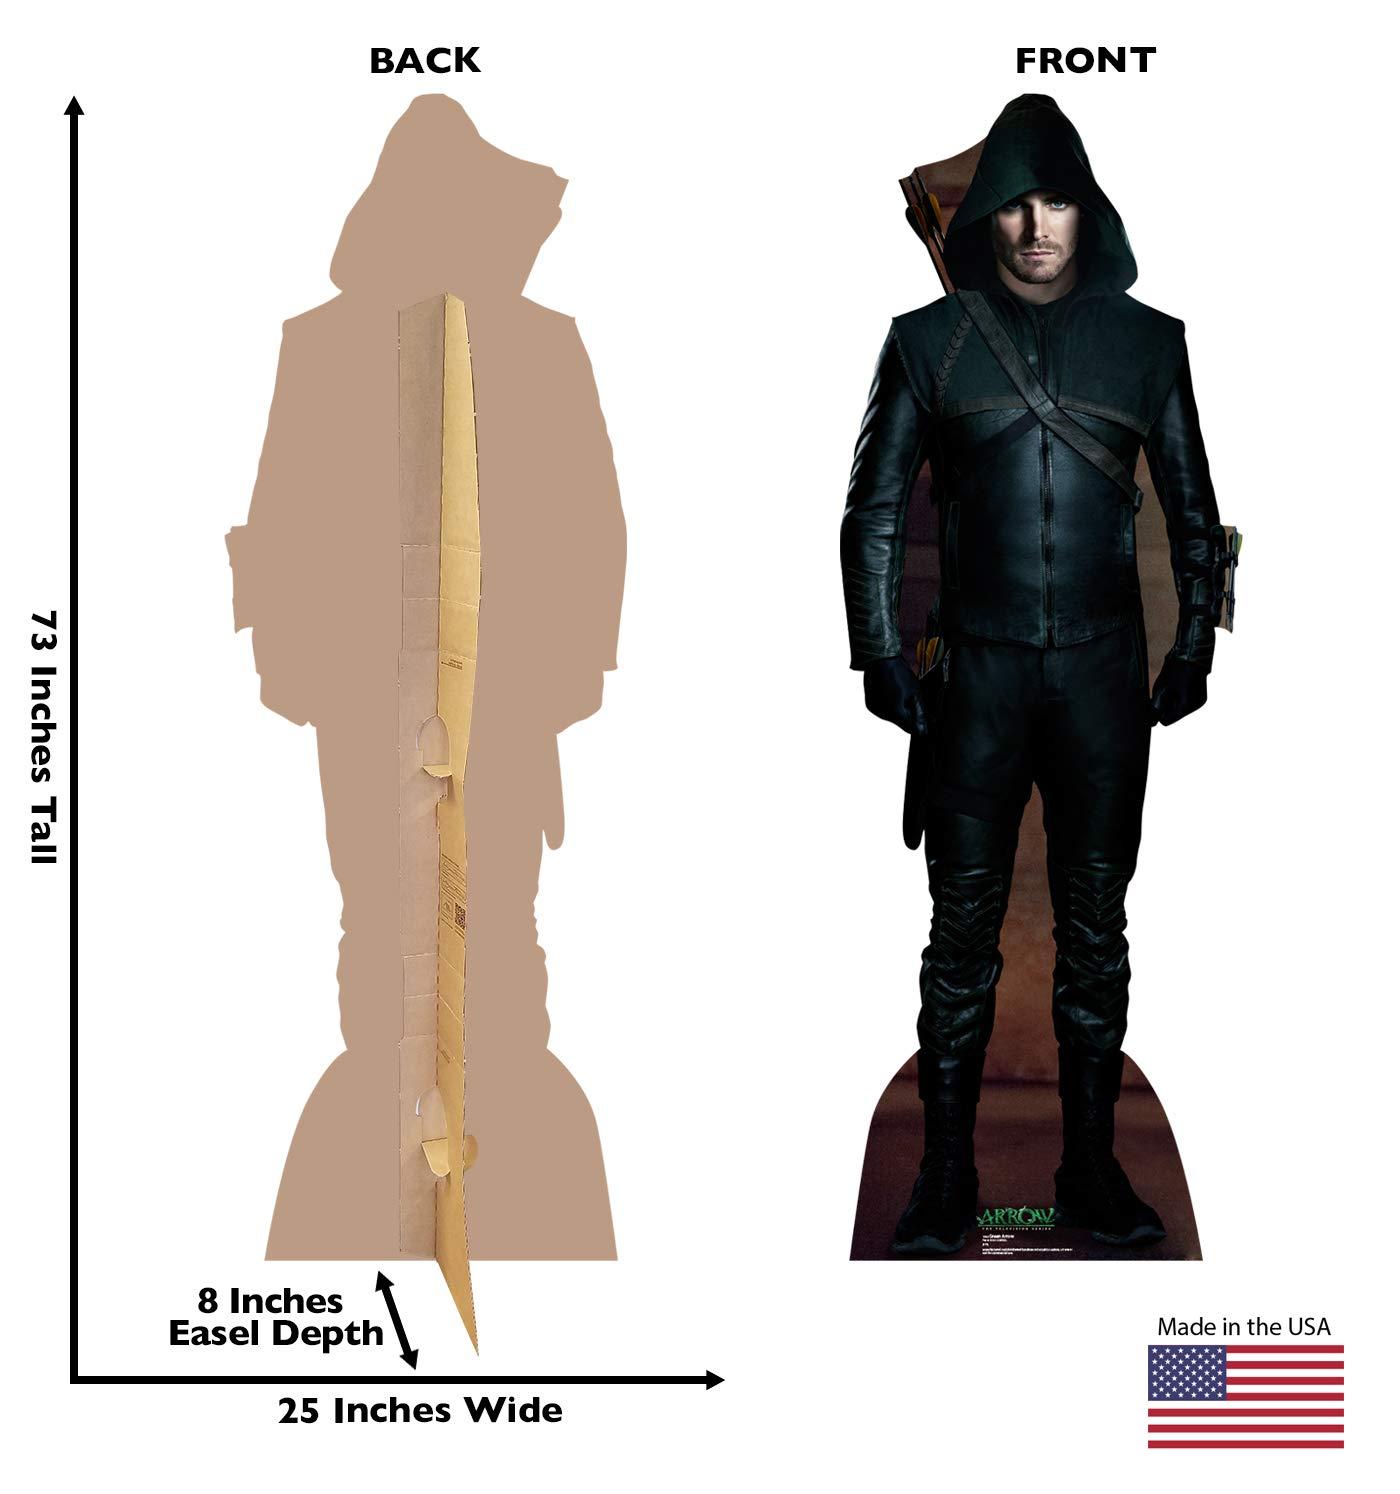 The CWs Arrow 1703 Advanced Graphics Green Arrow Life Size Cardboard Cutout Standup